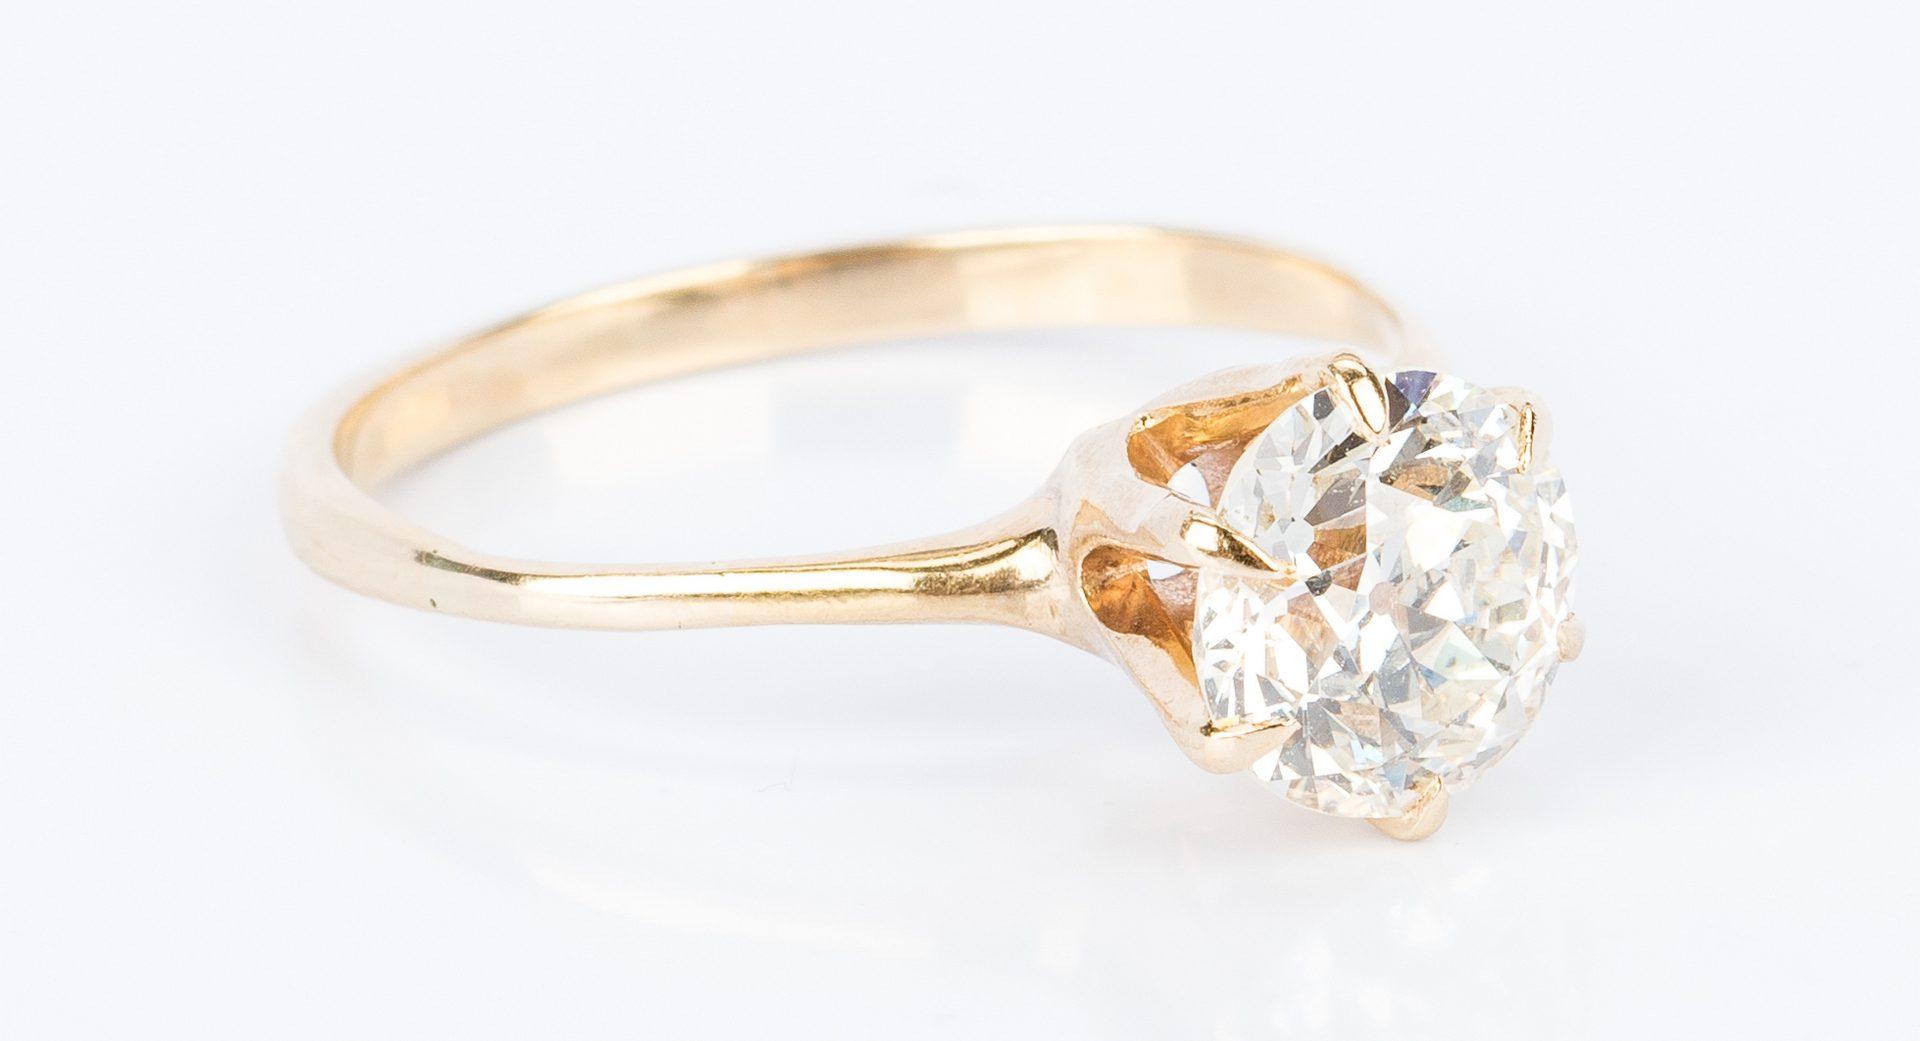 Lot 42: 2 ct. Old European Cut Diamond Ring